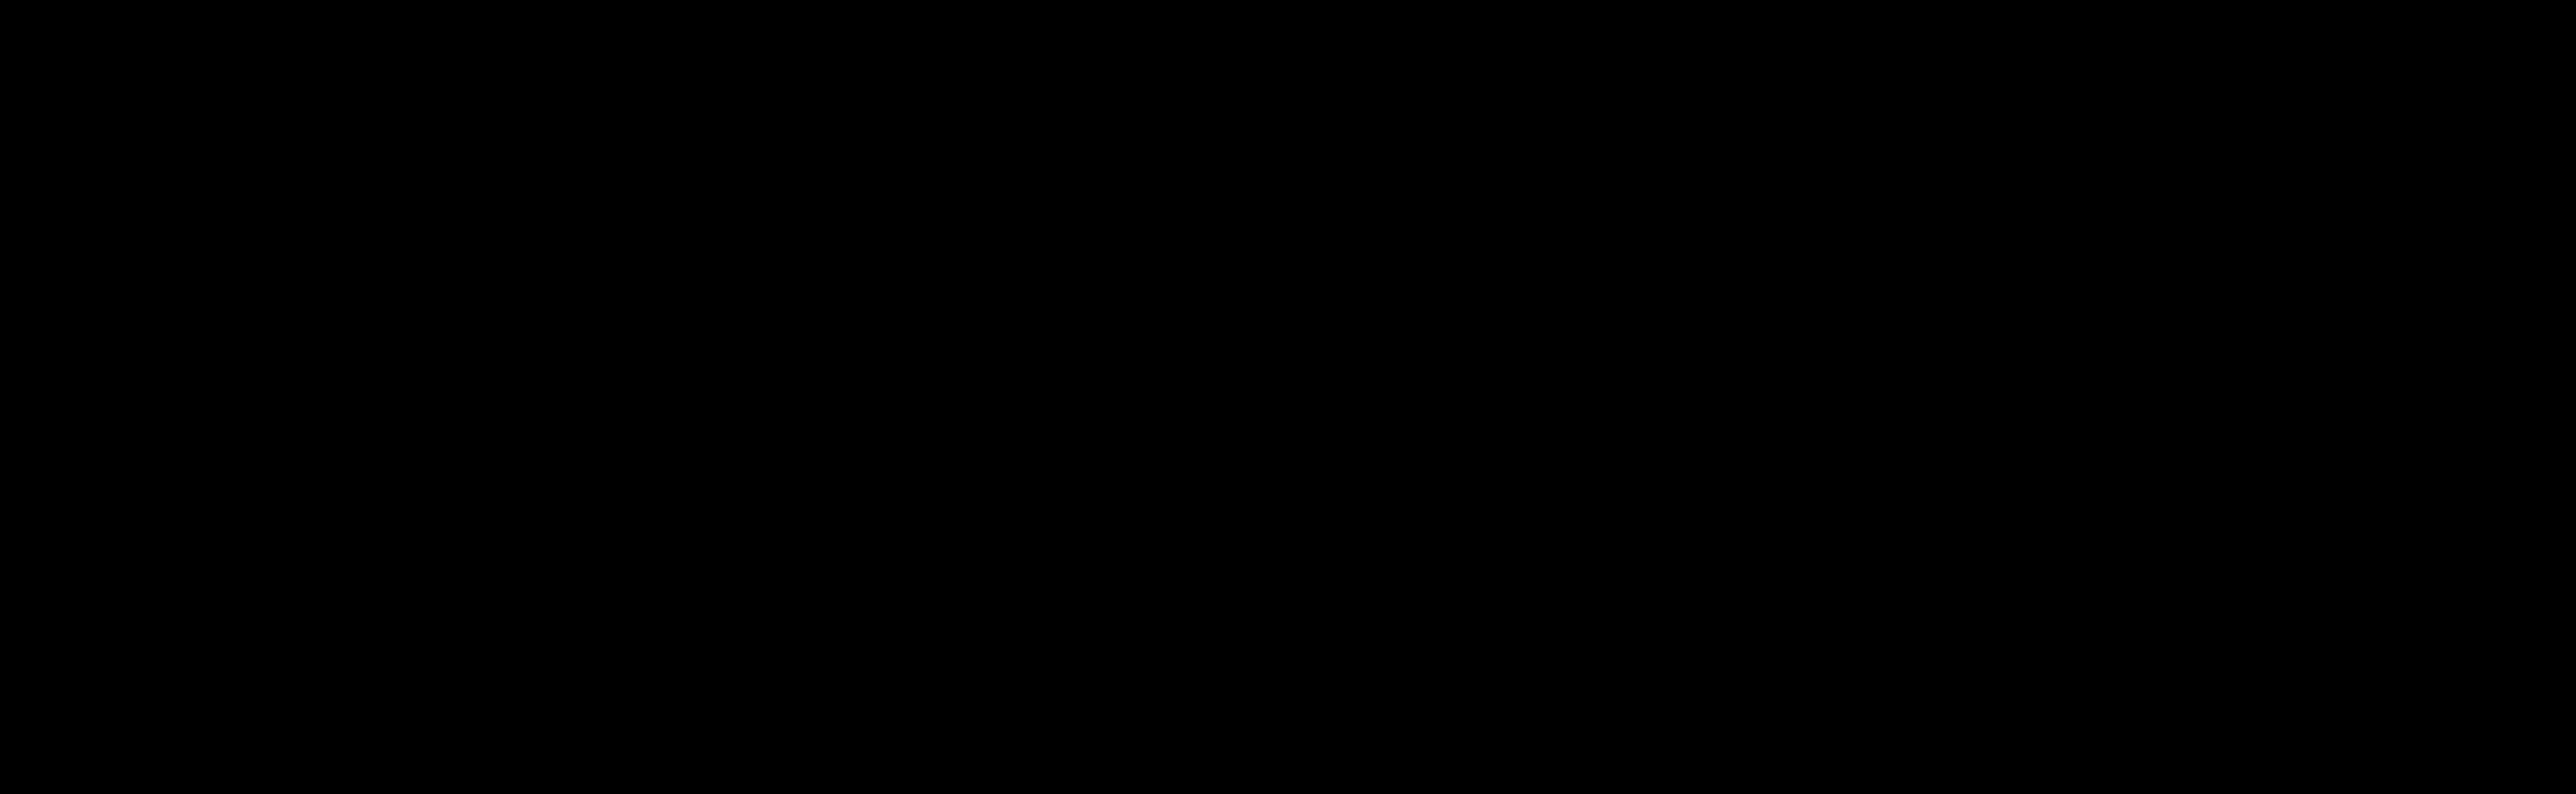 Bitpanda logo icon